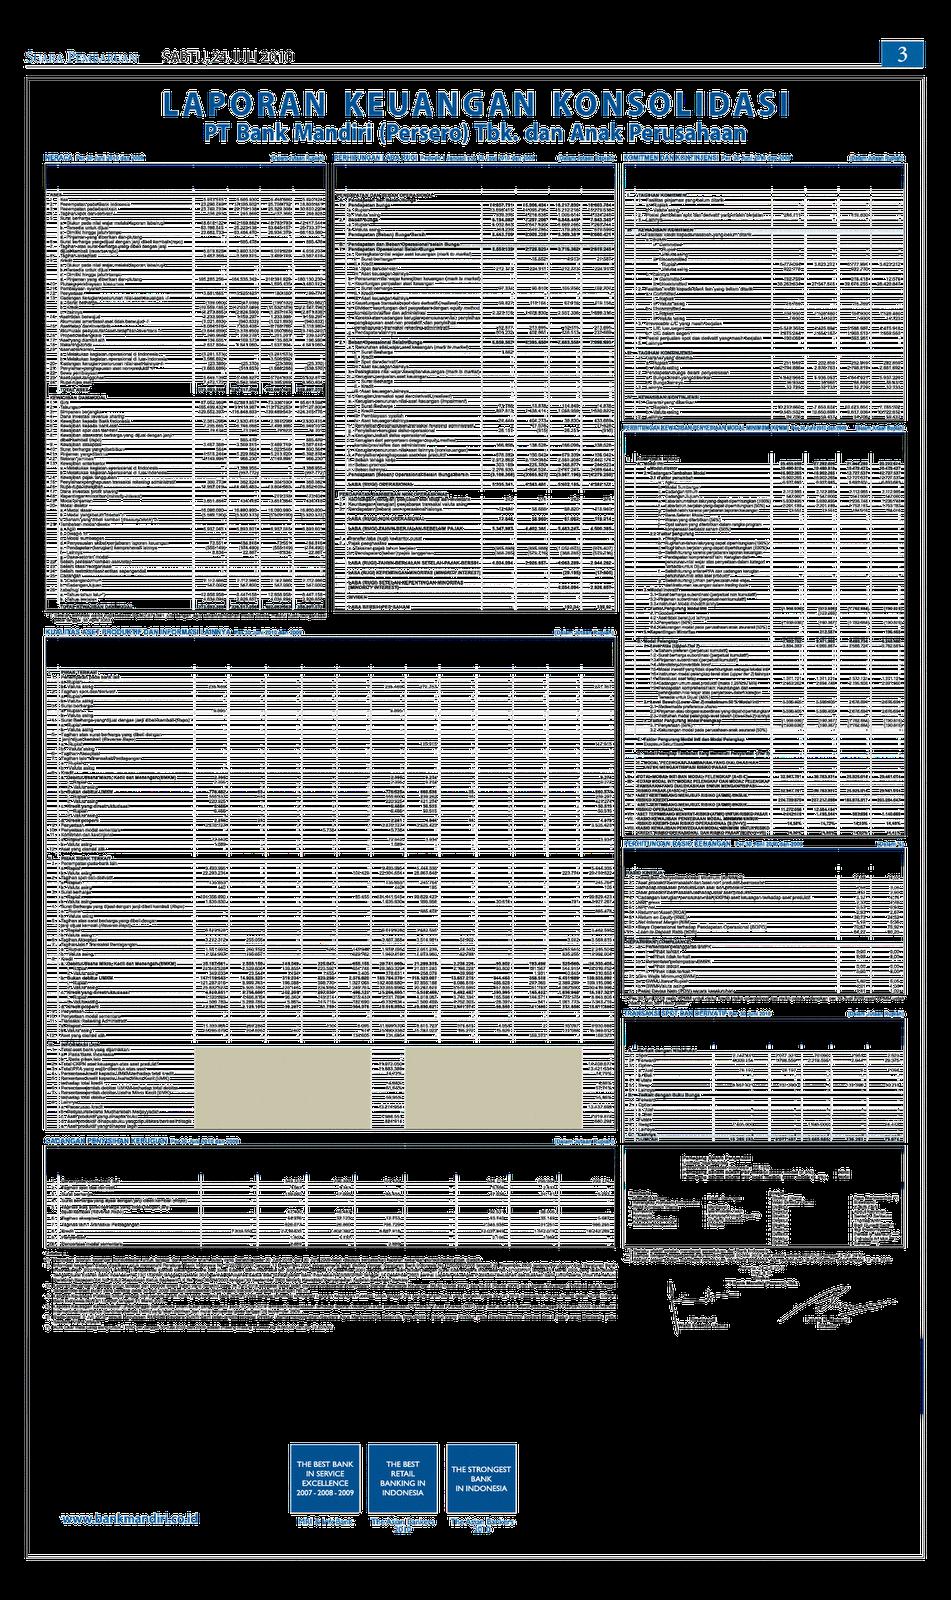 contoh laporan keuangan bank Mandiri